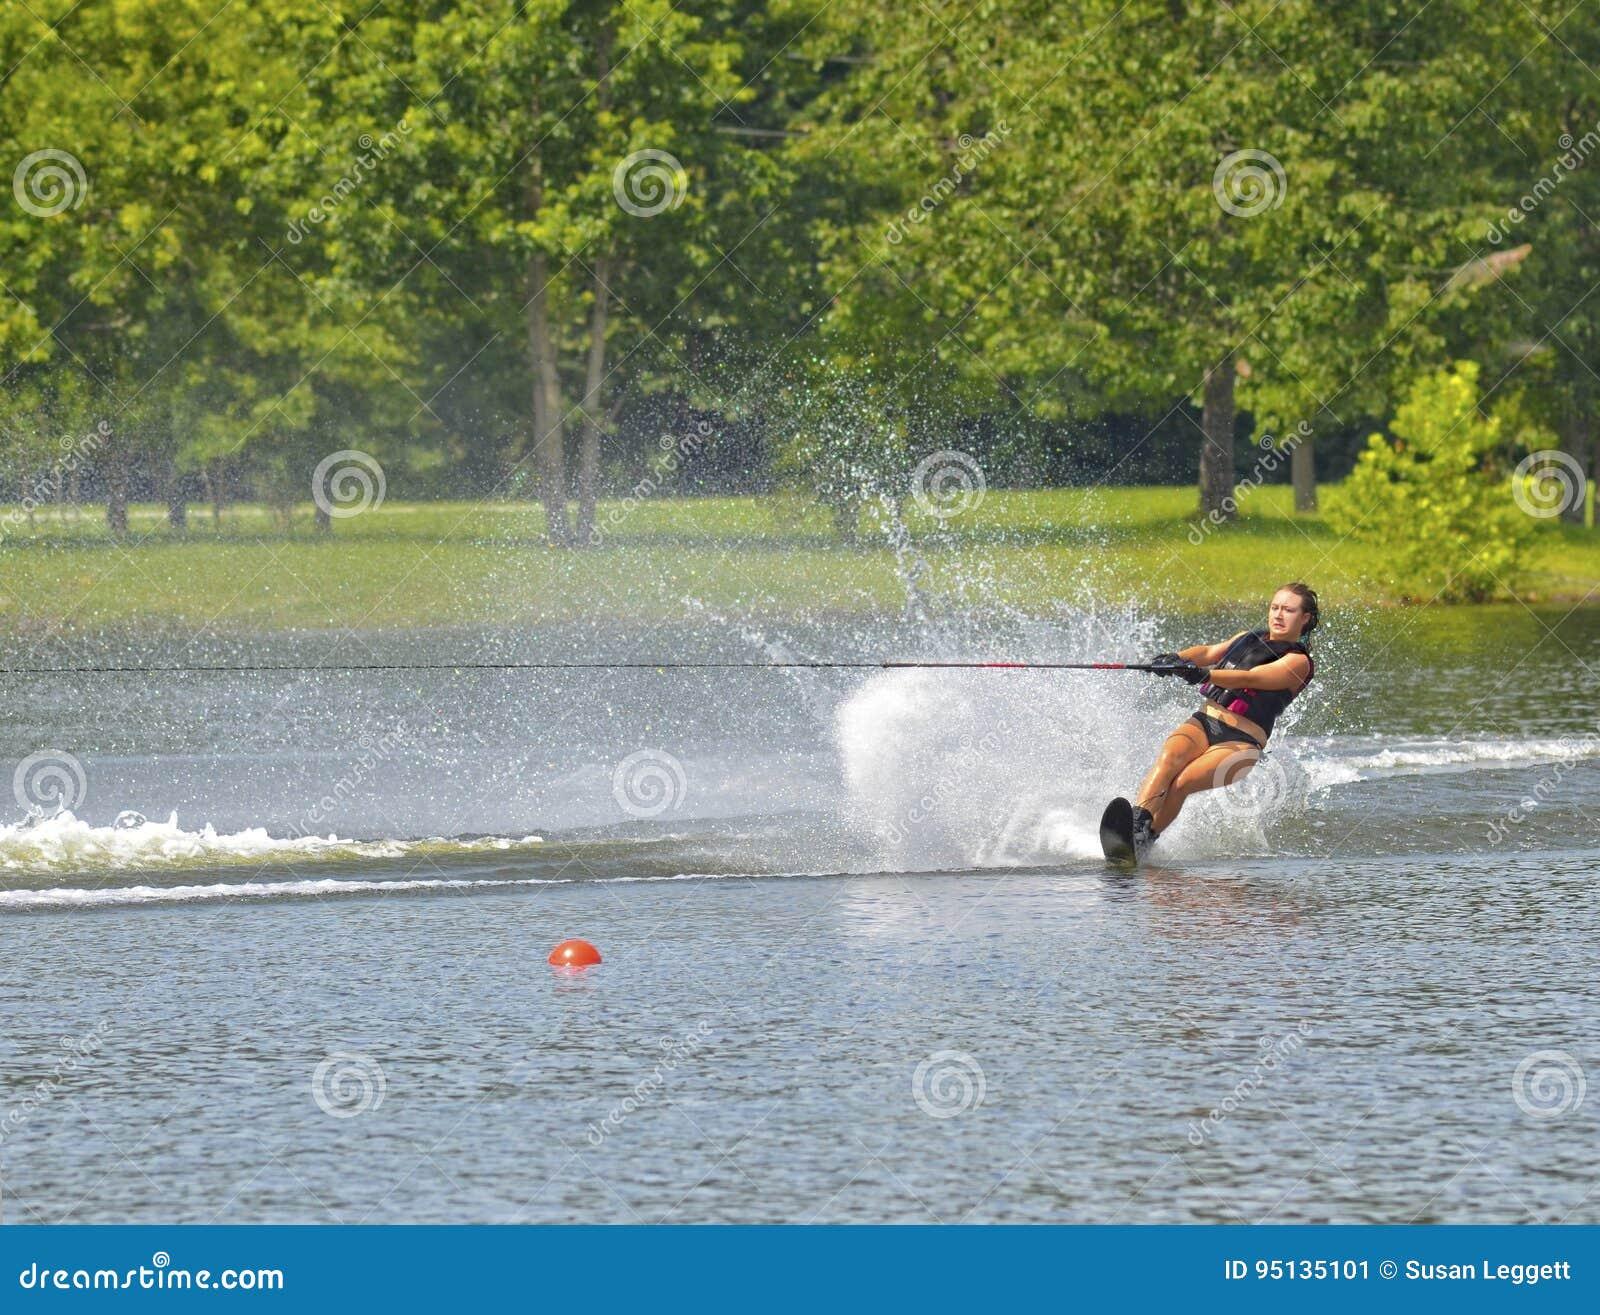 Tonårig flicka på vatten Ski Course